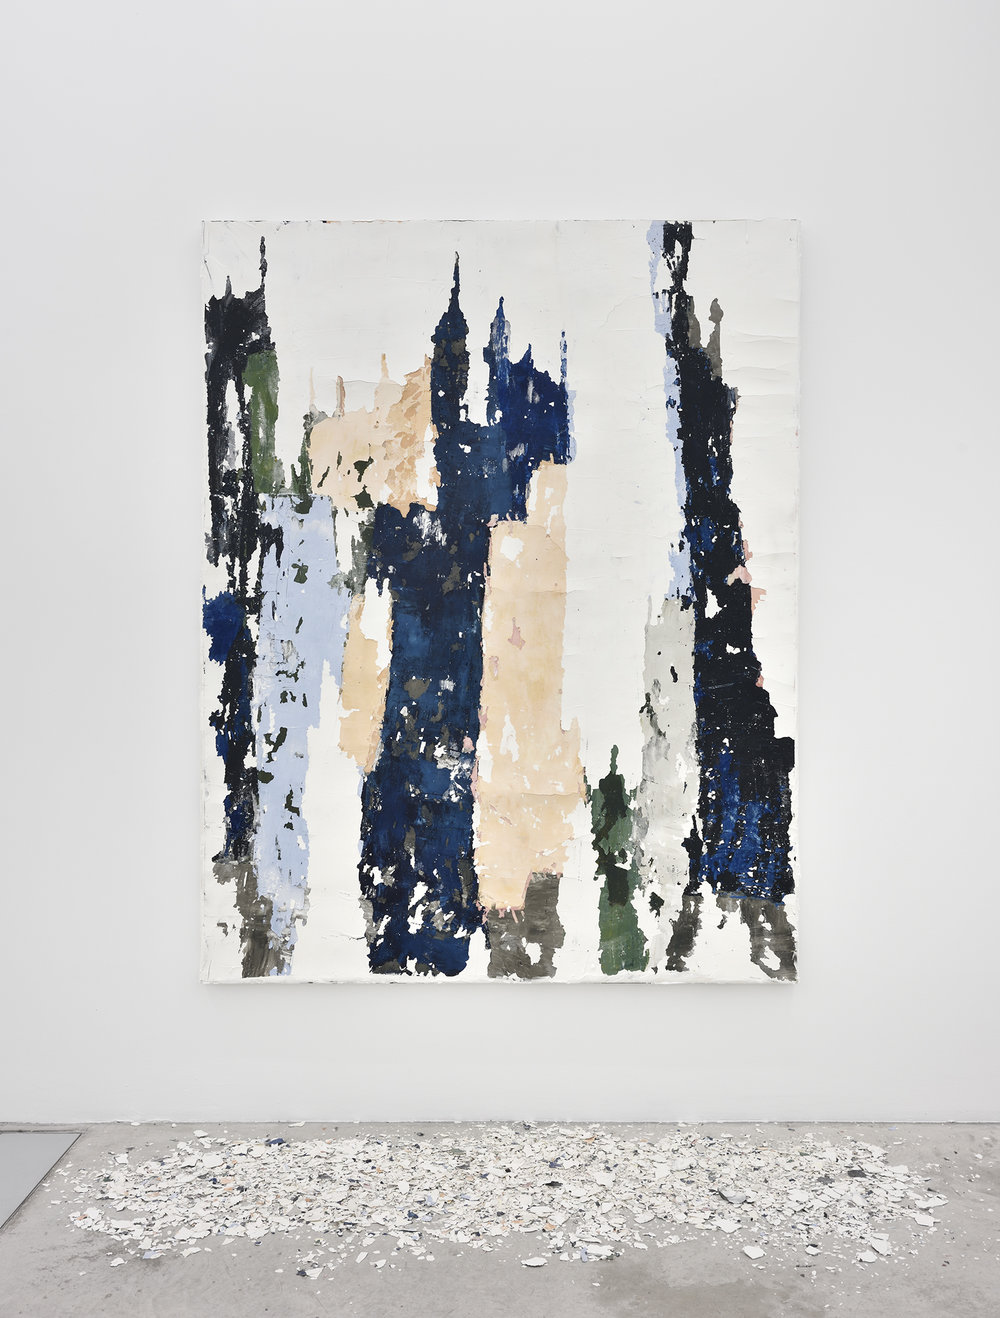 Manoela Medeiros  Ruine , 2018 paint, plaster and fragments 185 x 145 x 3,5 cm